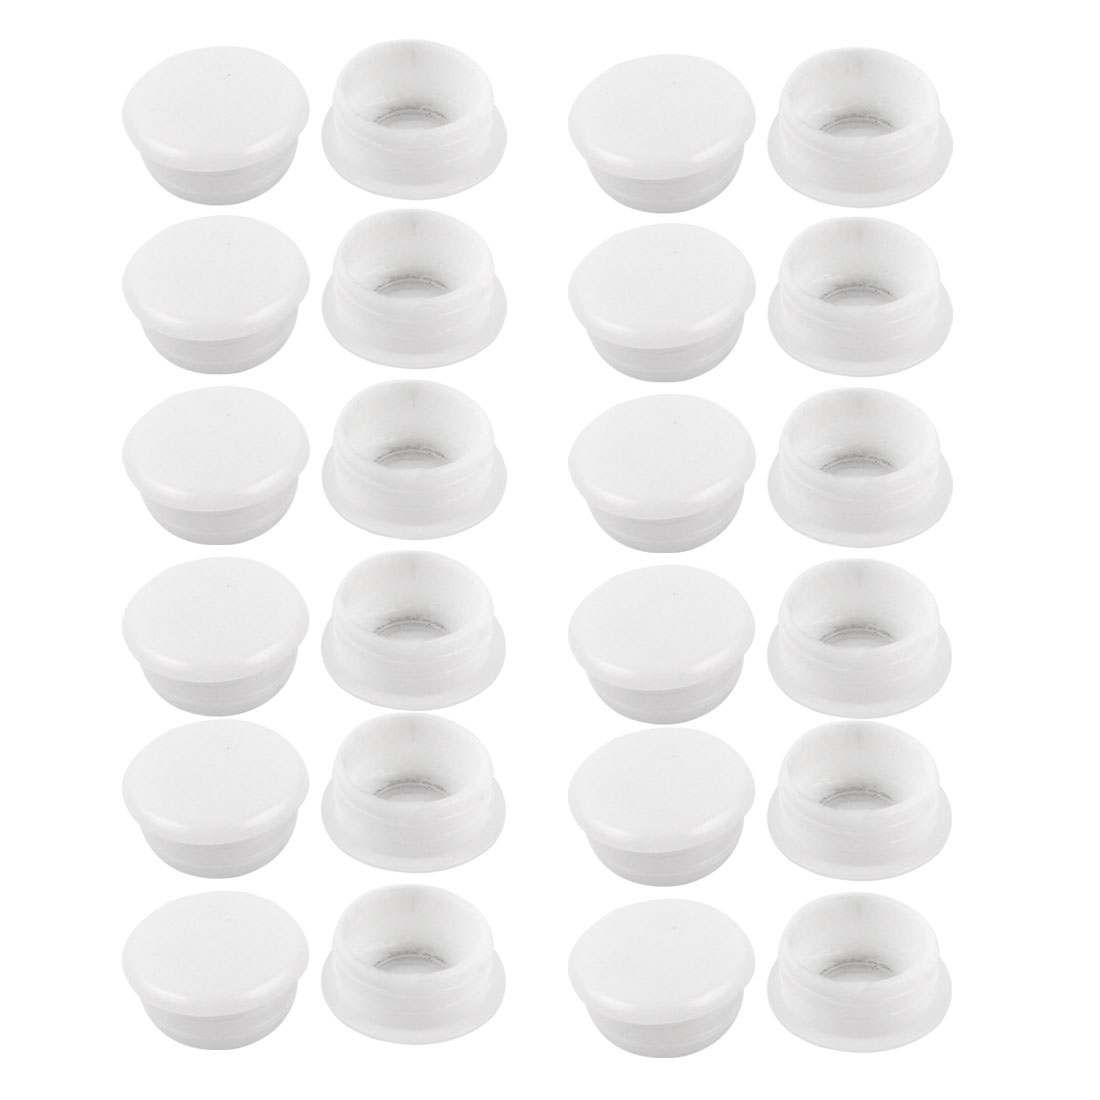 24 Pcs White Plastic 15mm Dia Round Tubing Tube Insert Caps Covers